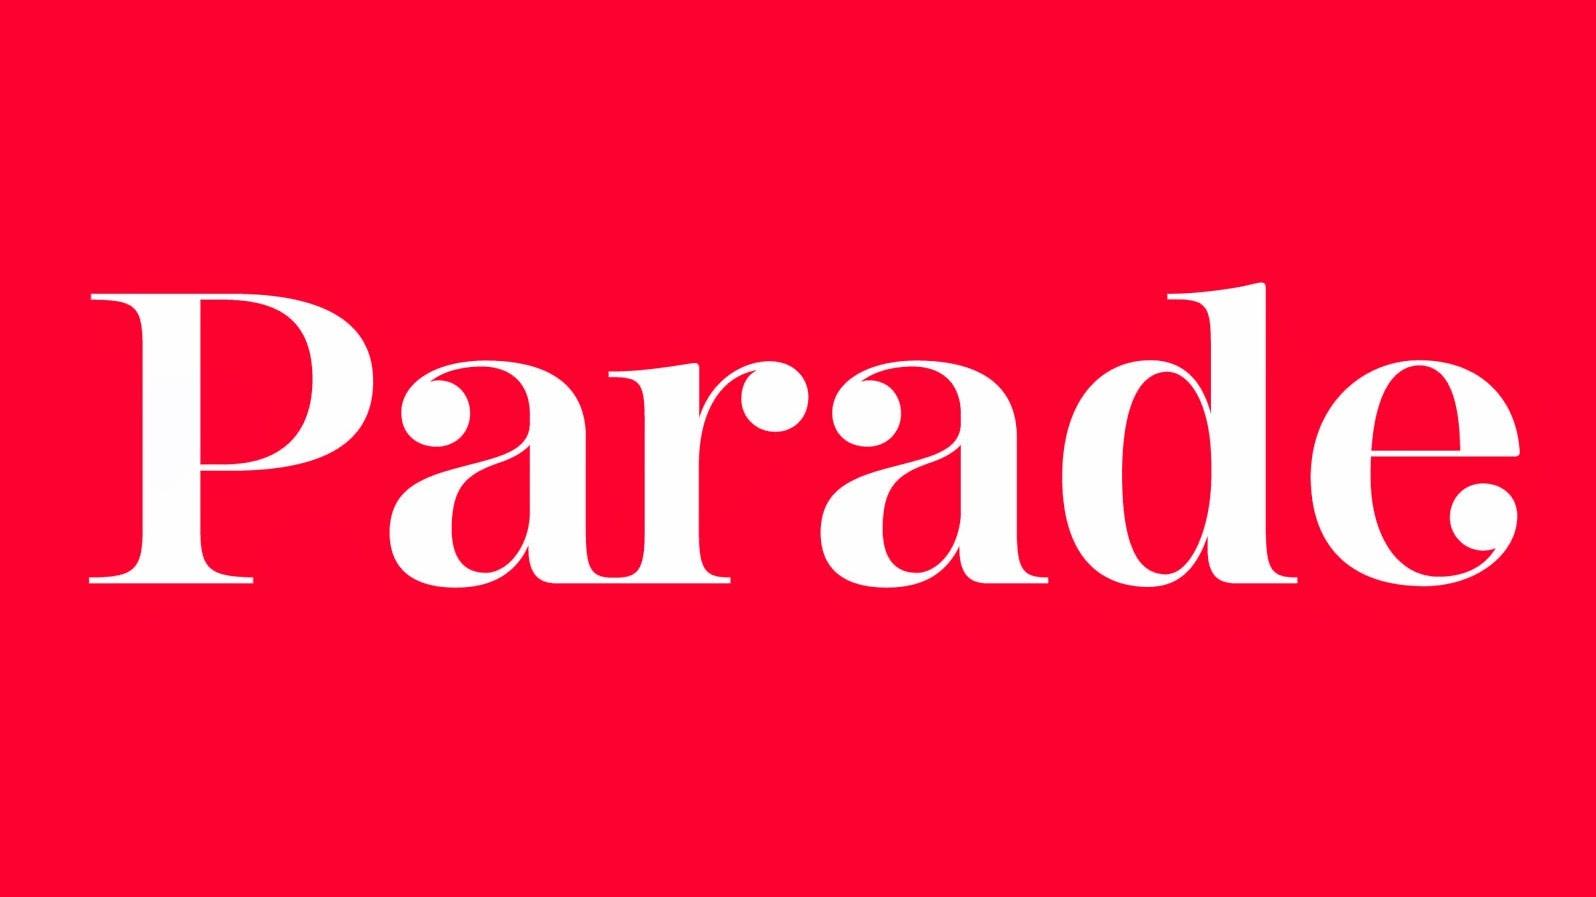 Parade.jpg